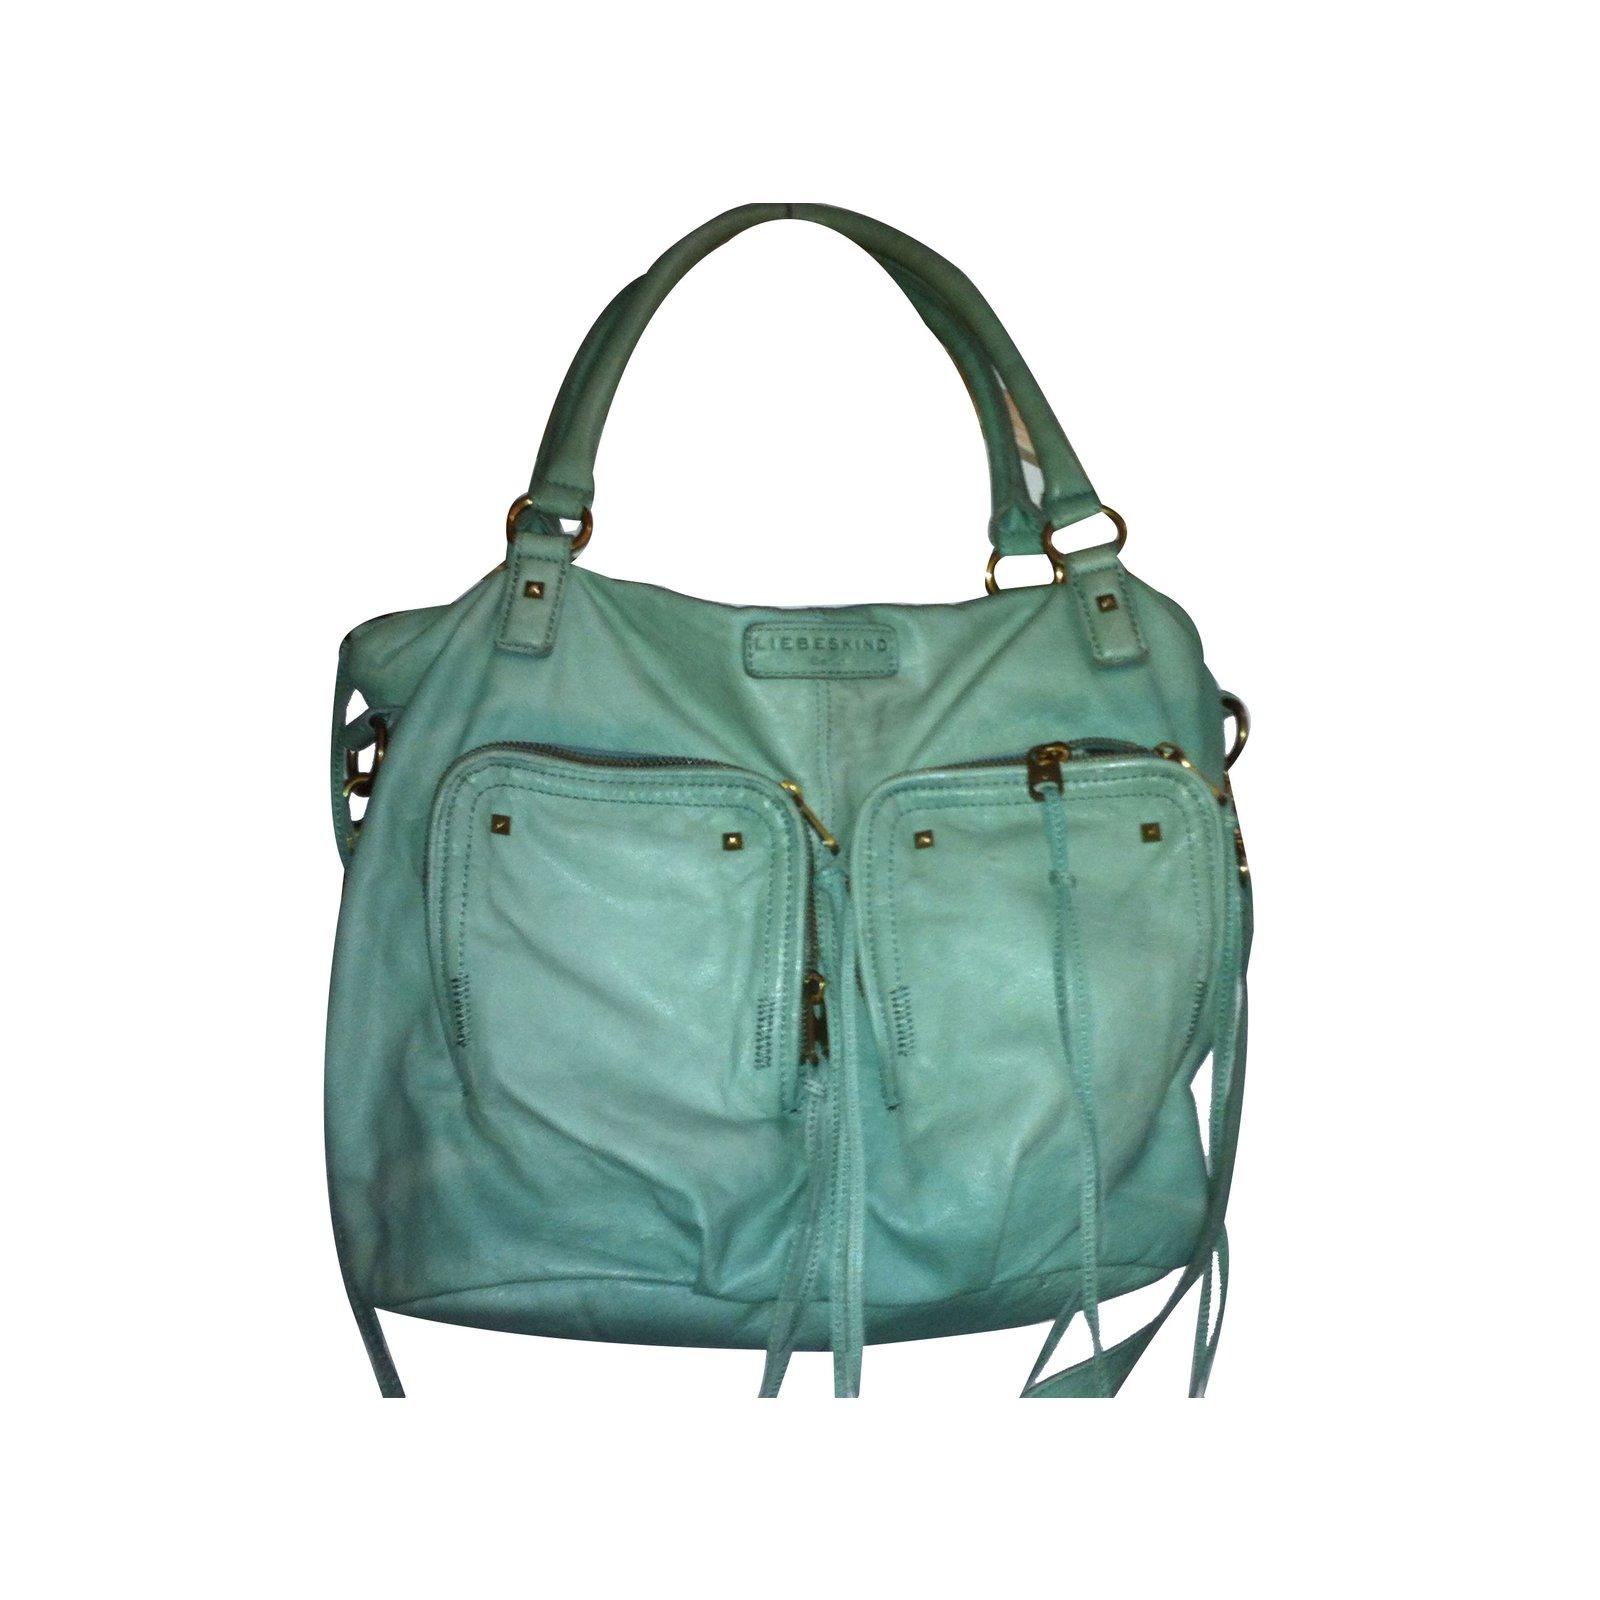 Liebeskind Berlin Handbags Leather Green Ref 15890